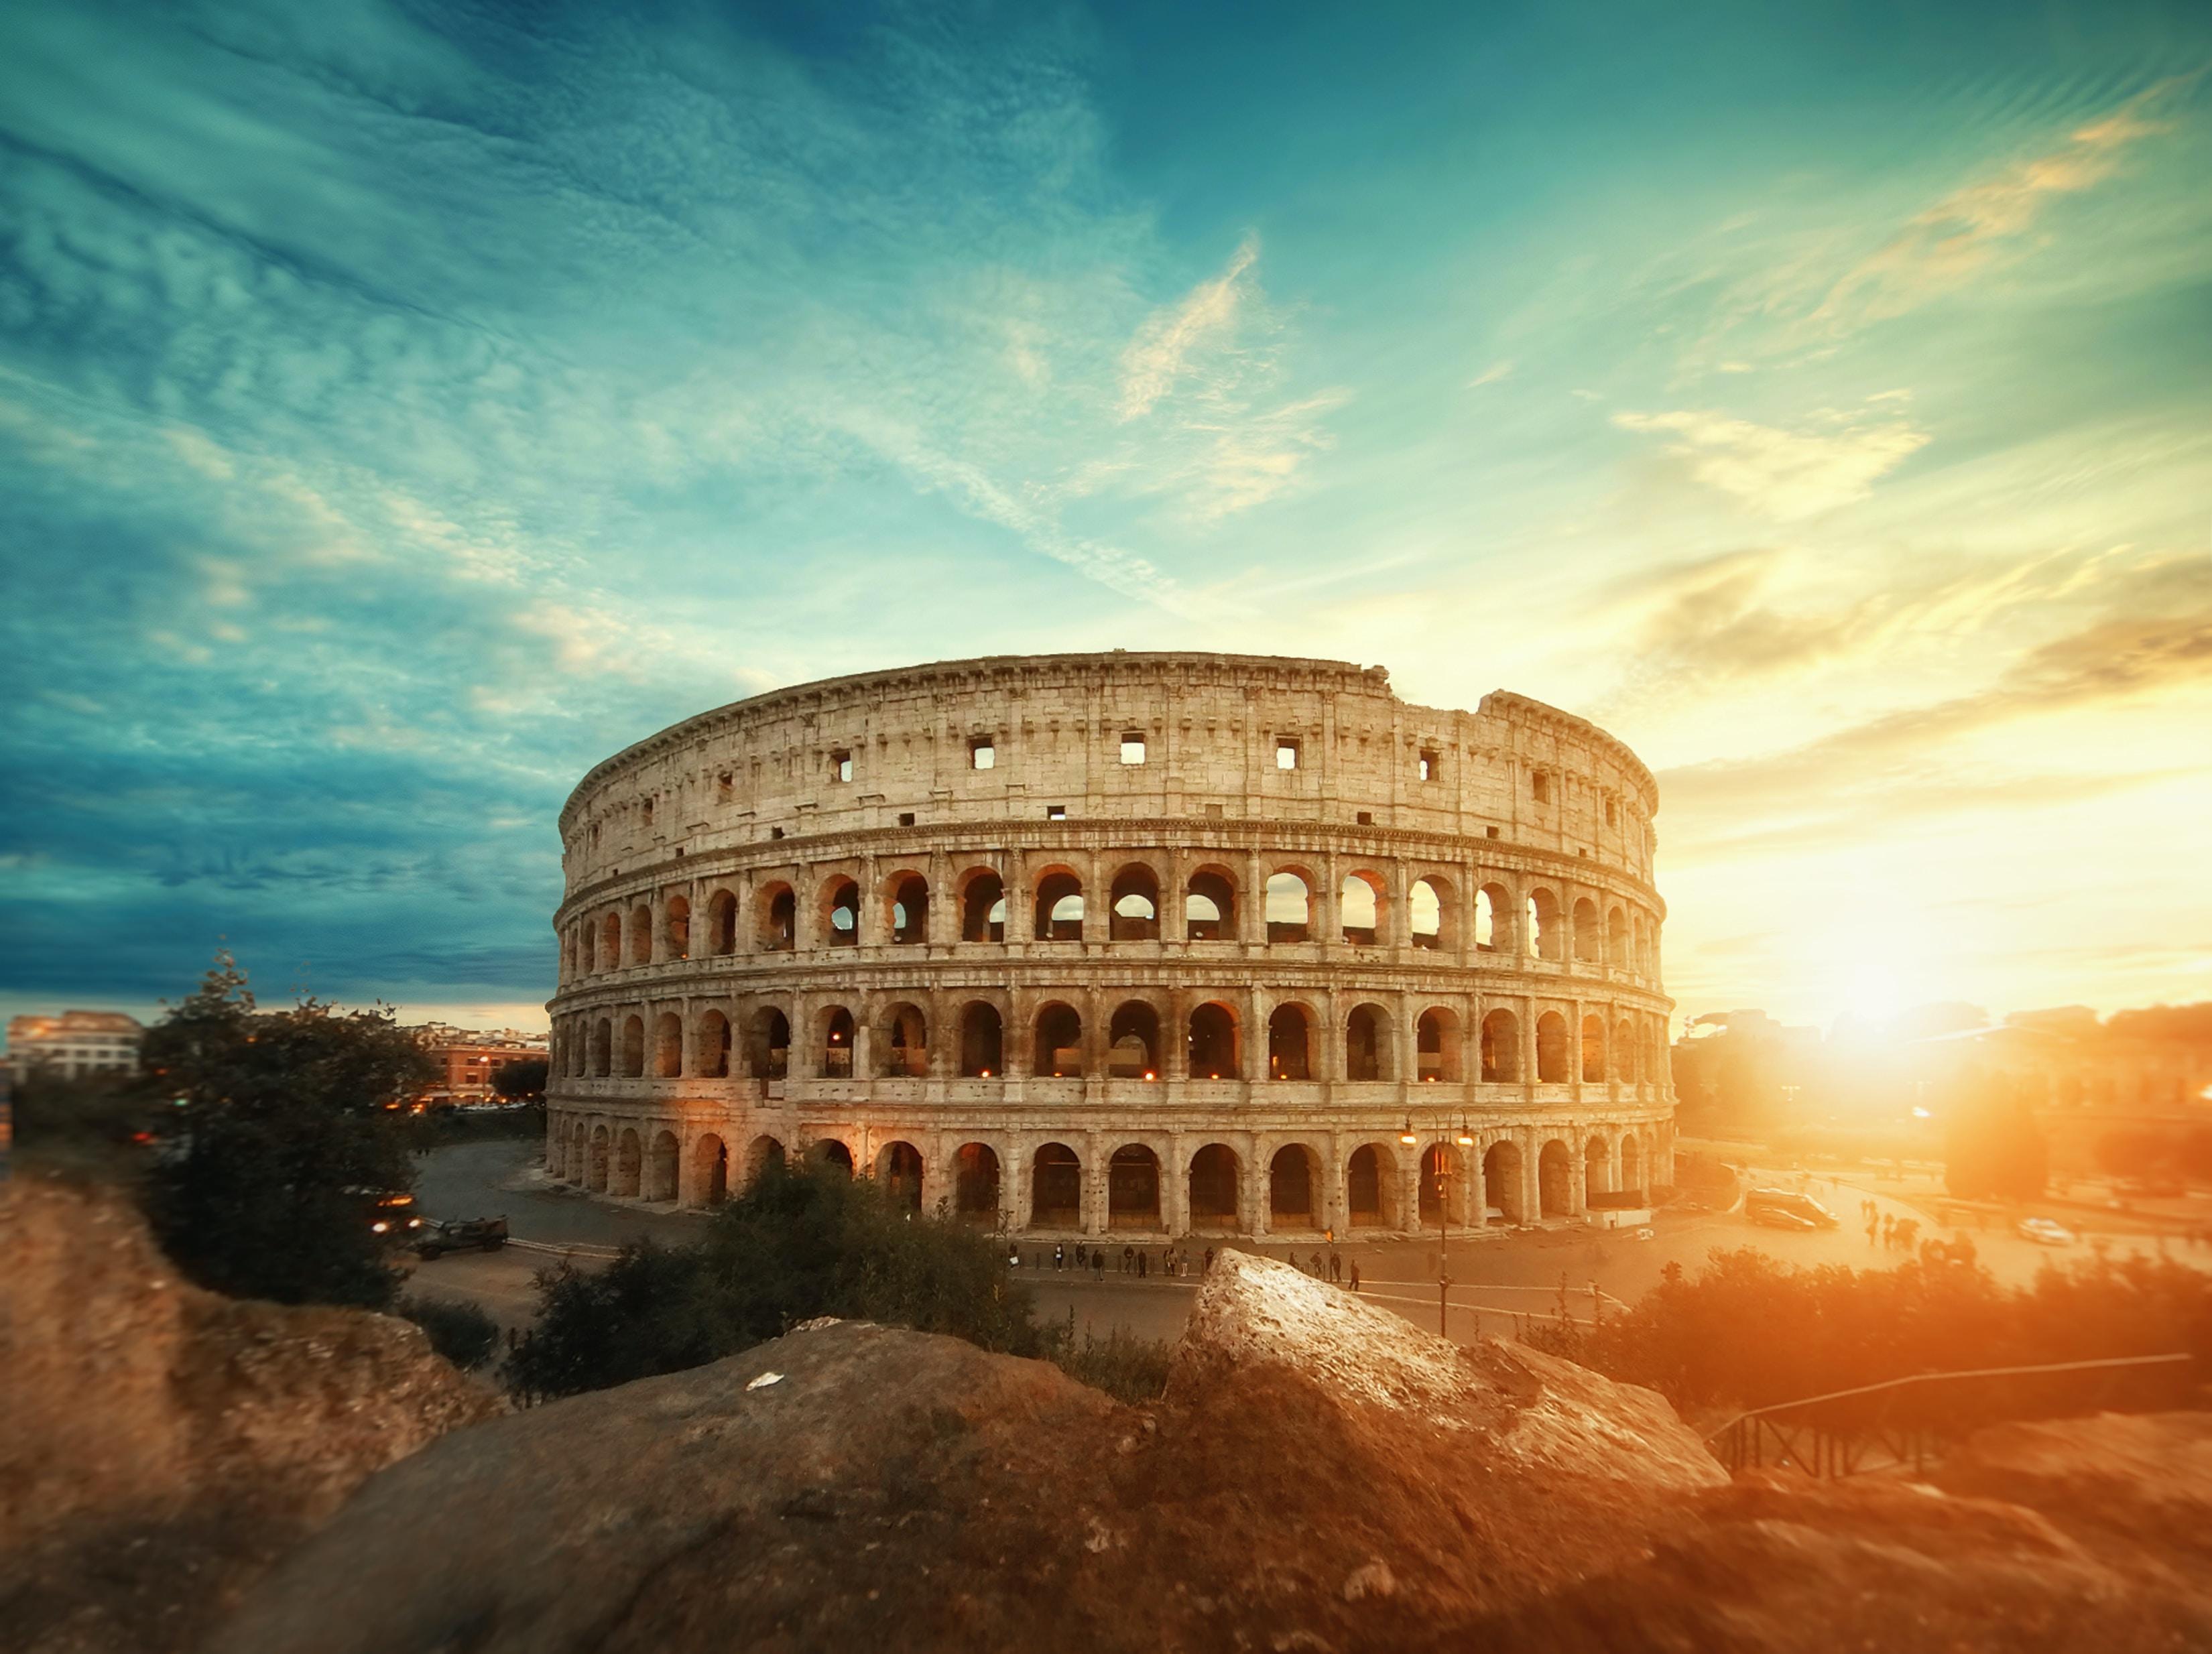 Colosseo - Rome